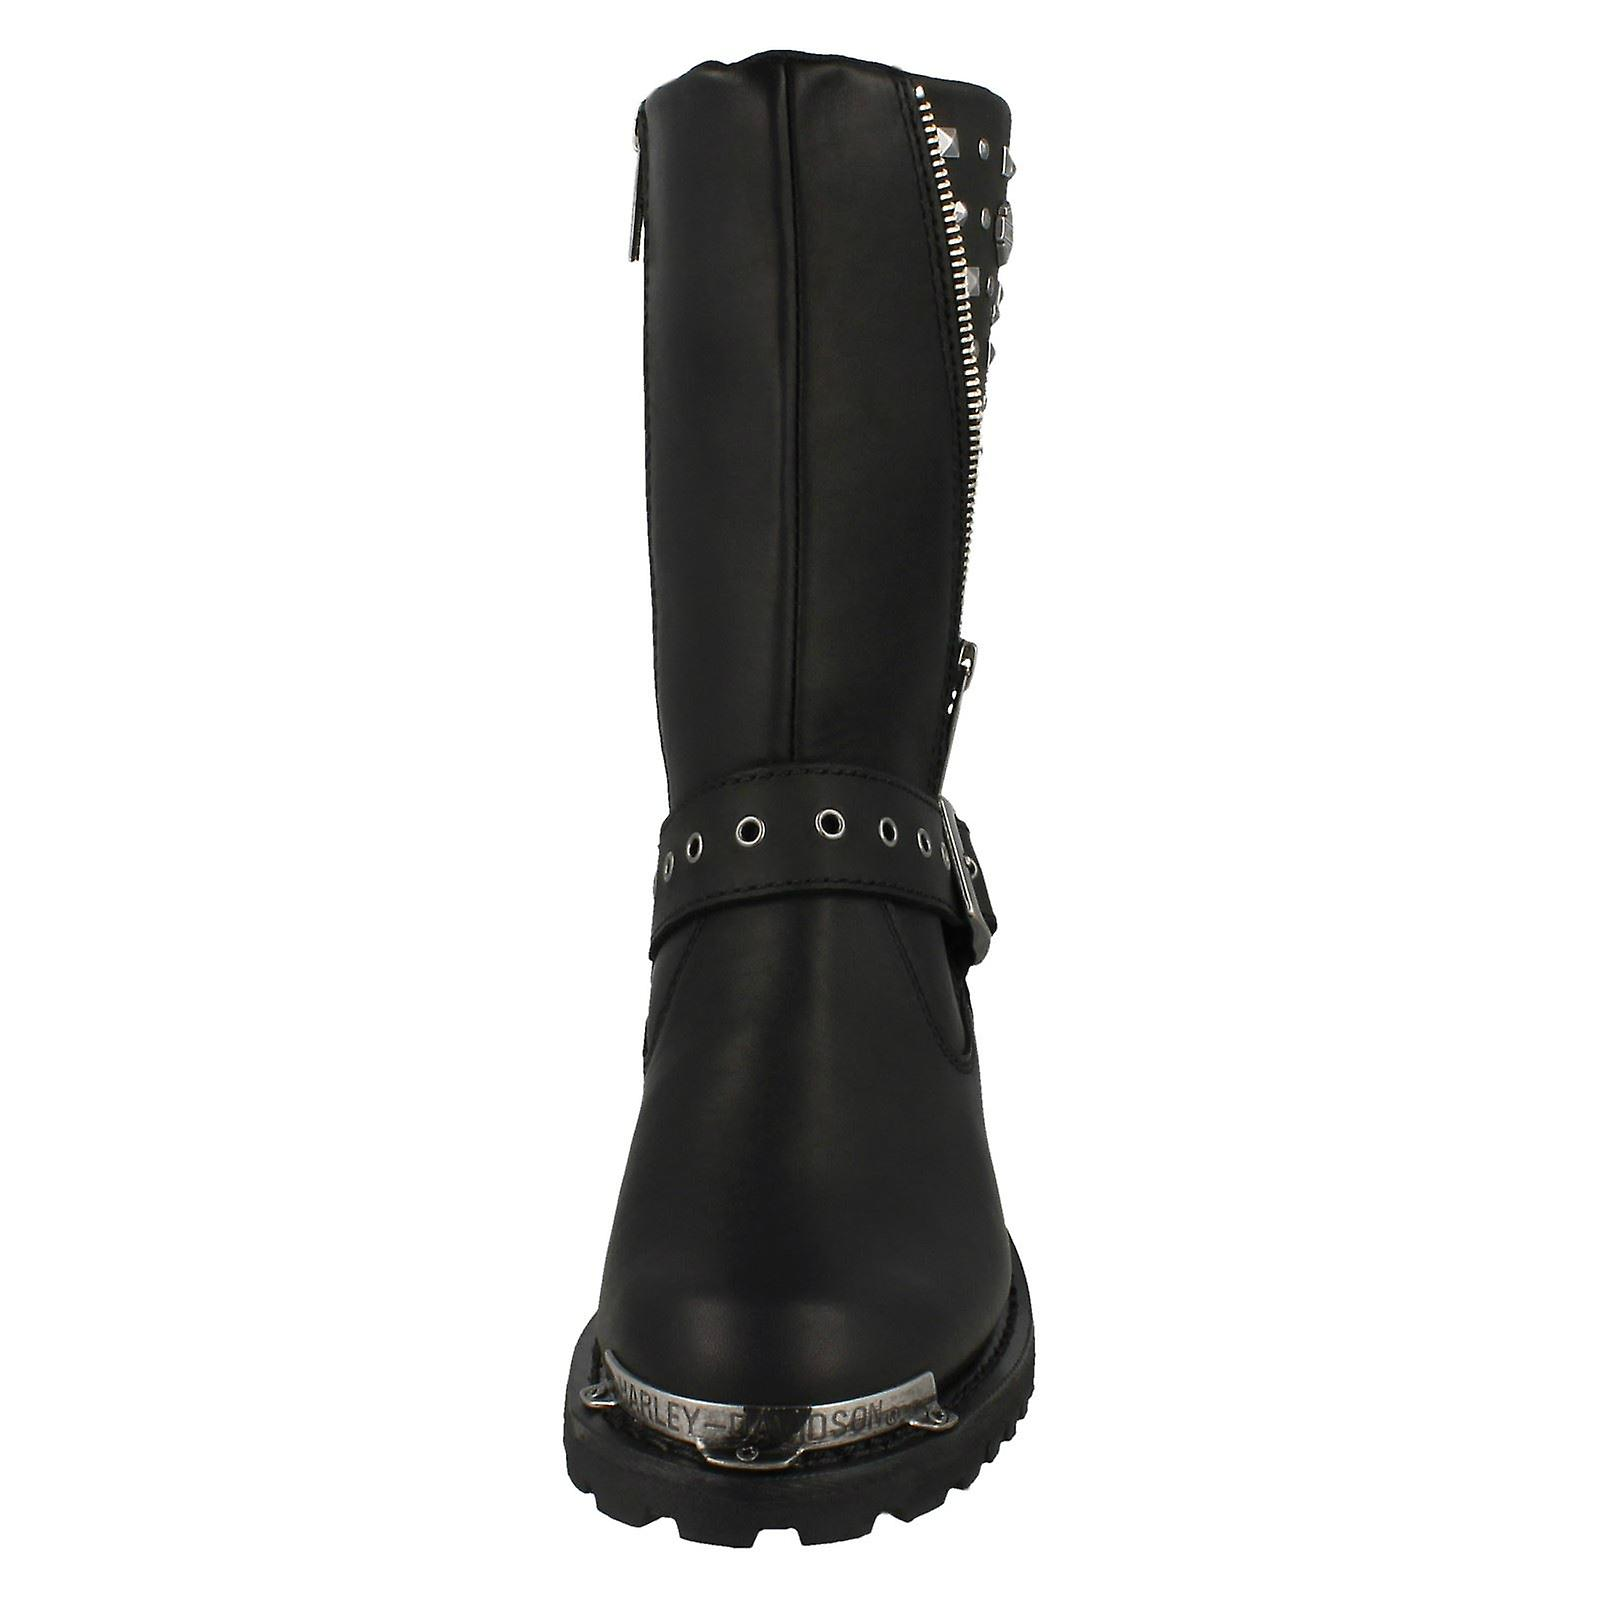 Ladies Harley Davidson Studded Calf High Biker Boots Tanya